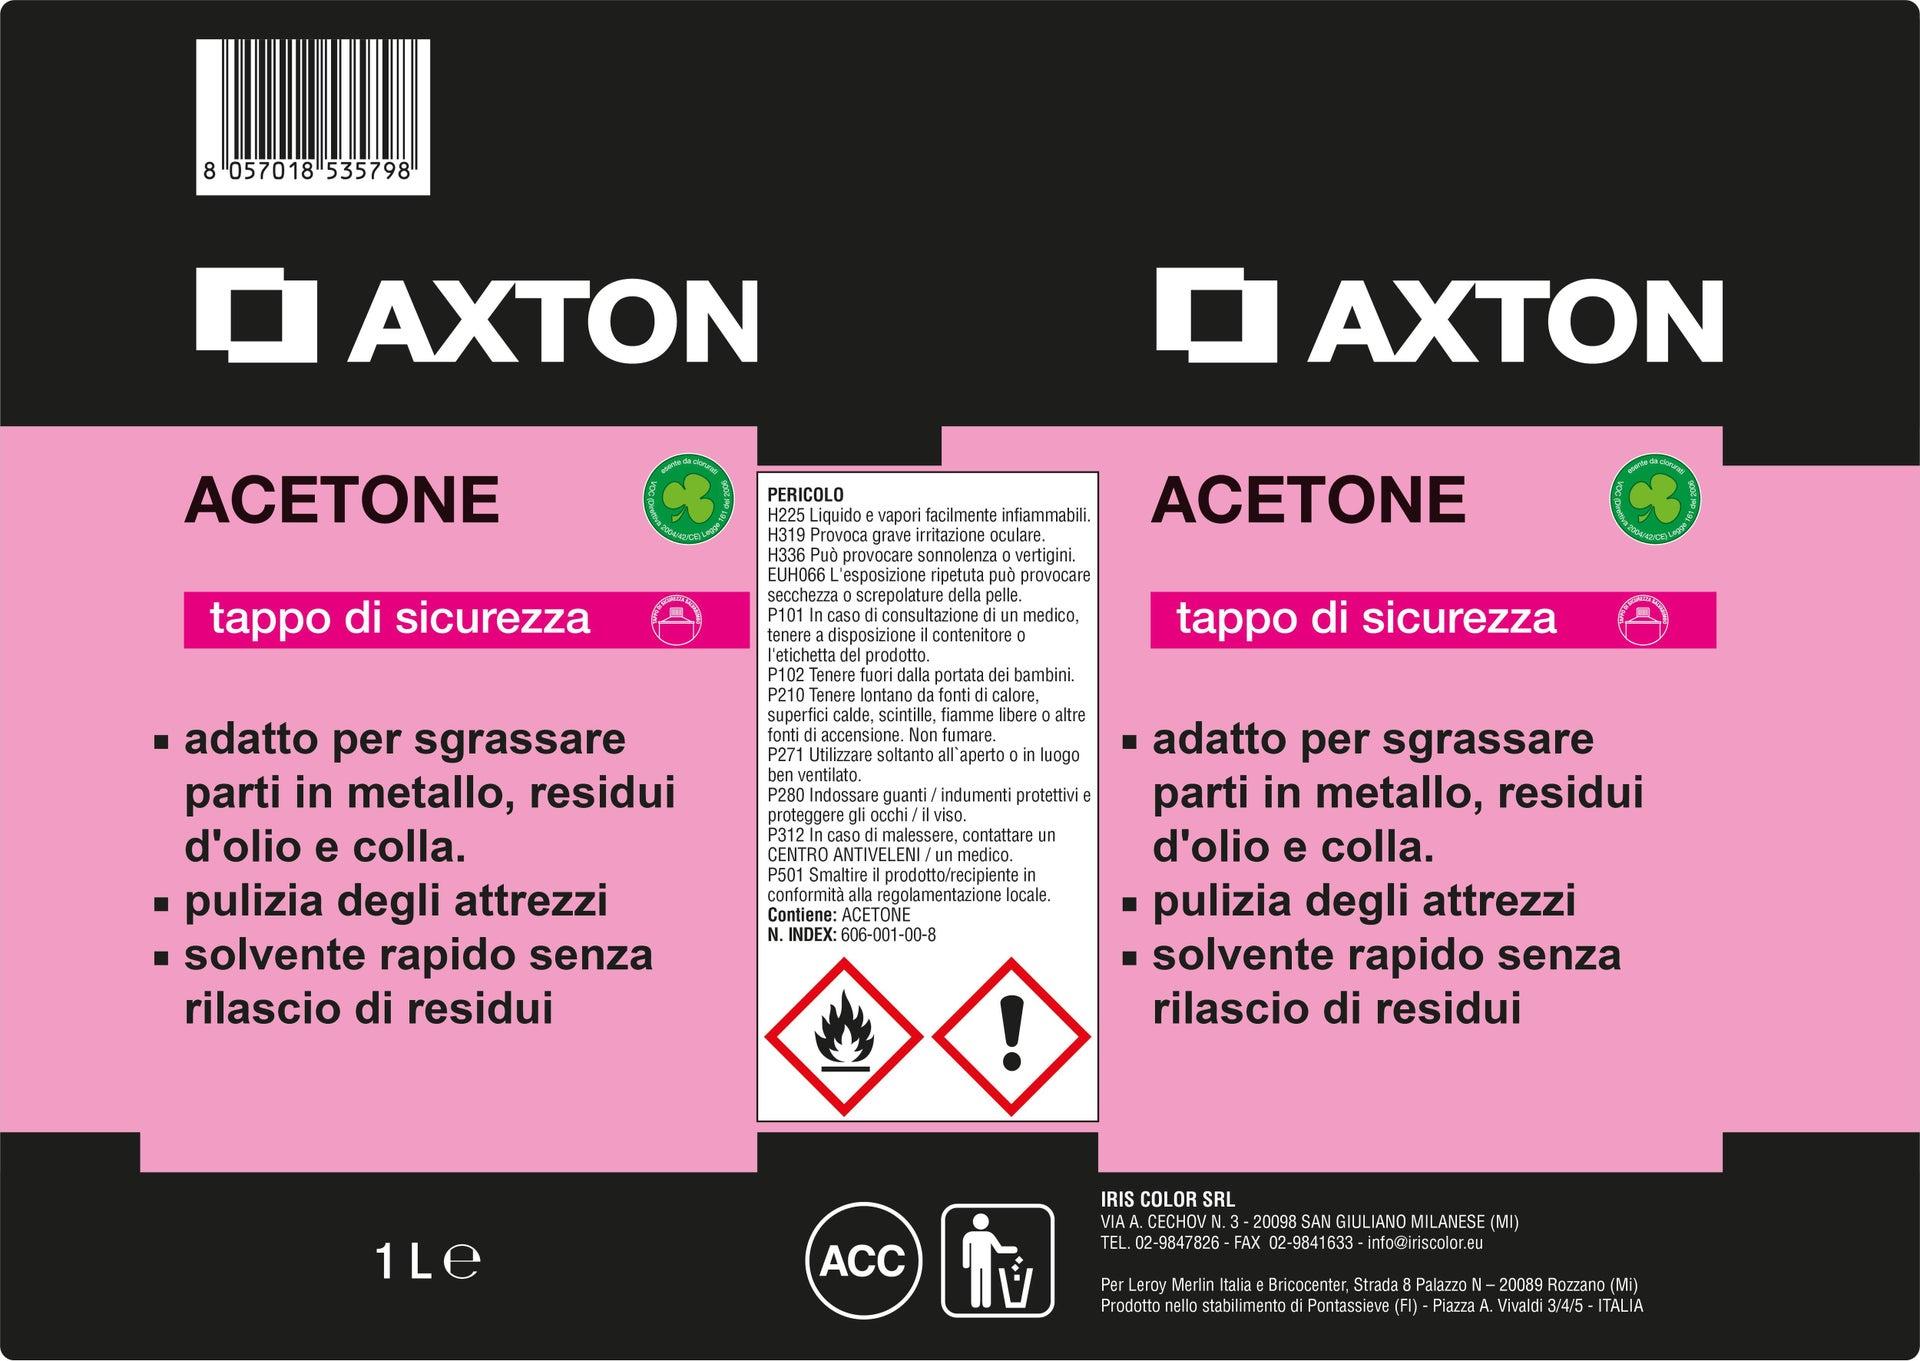 Acetone AXTON 1 - 3